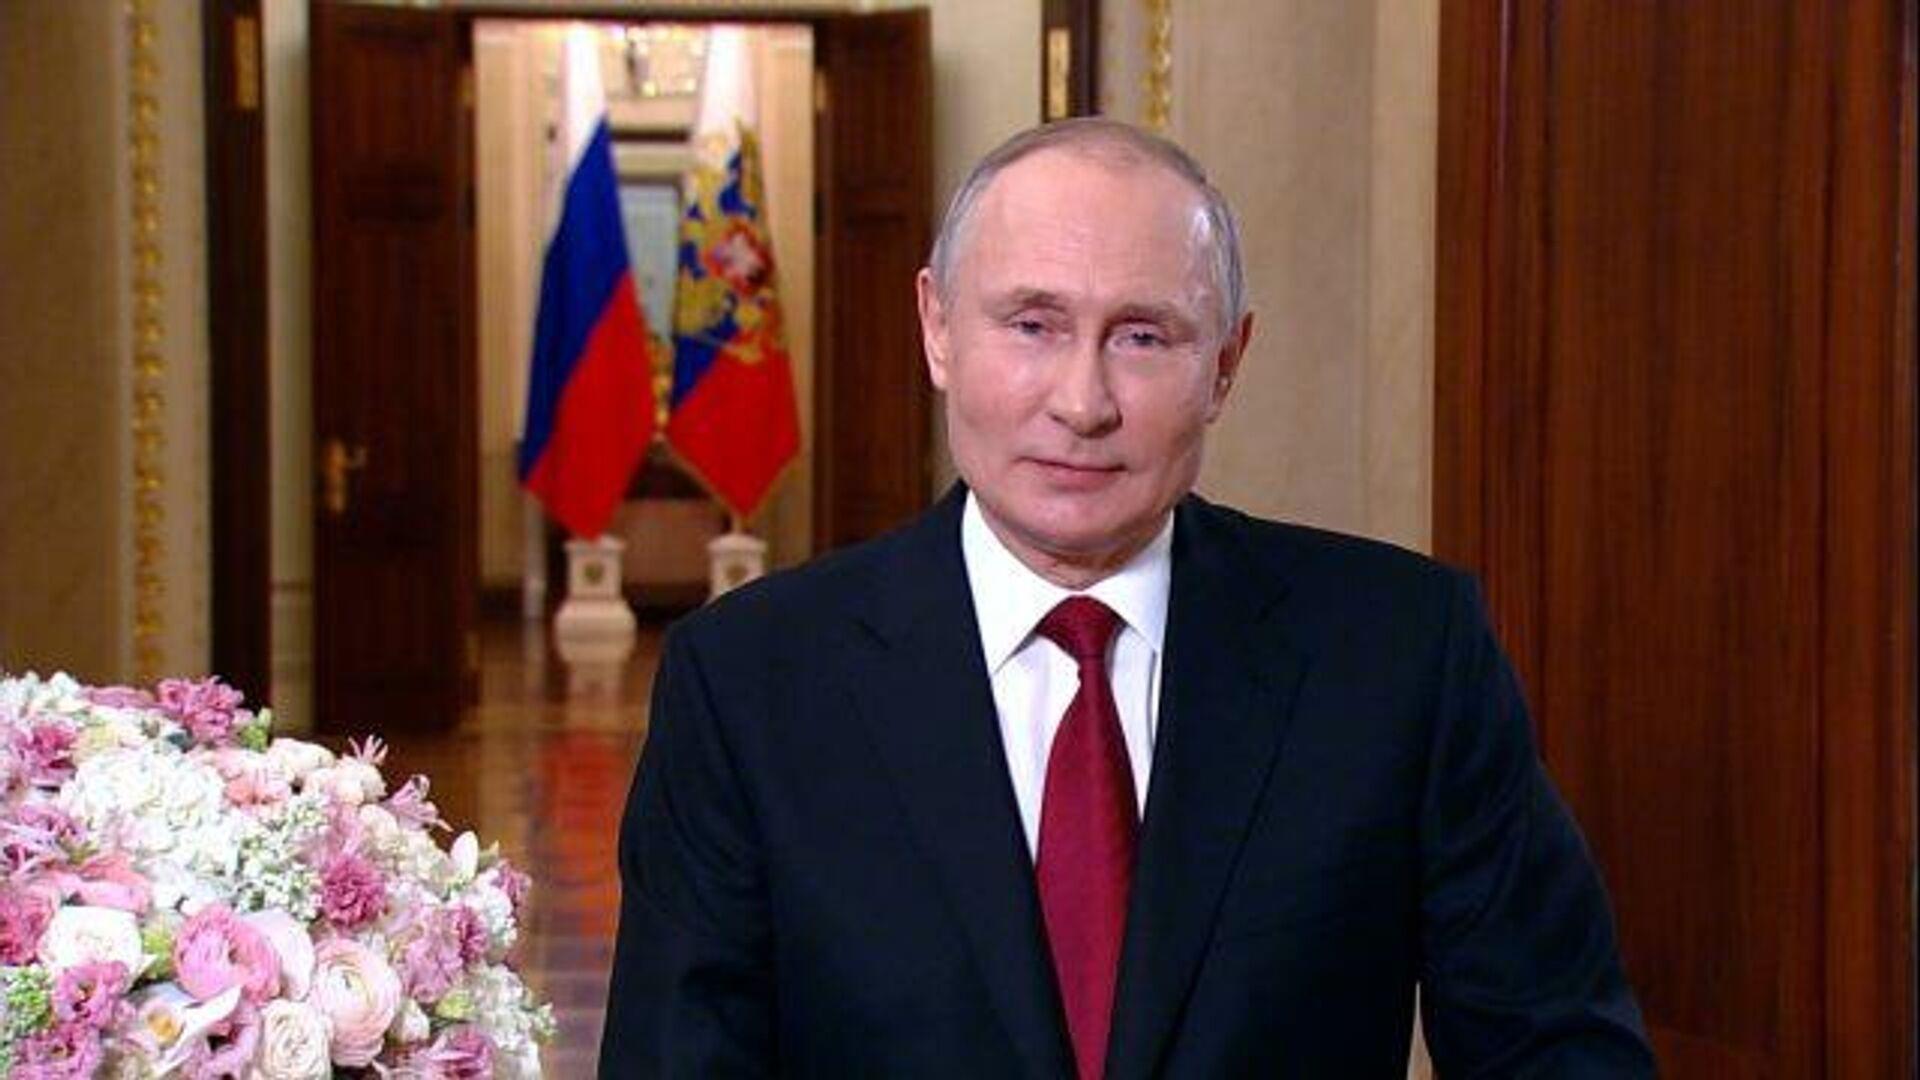 Владимир Путин поздравил женщин с 8 Марта - РИА Новости, 1920, 08.03.2021